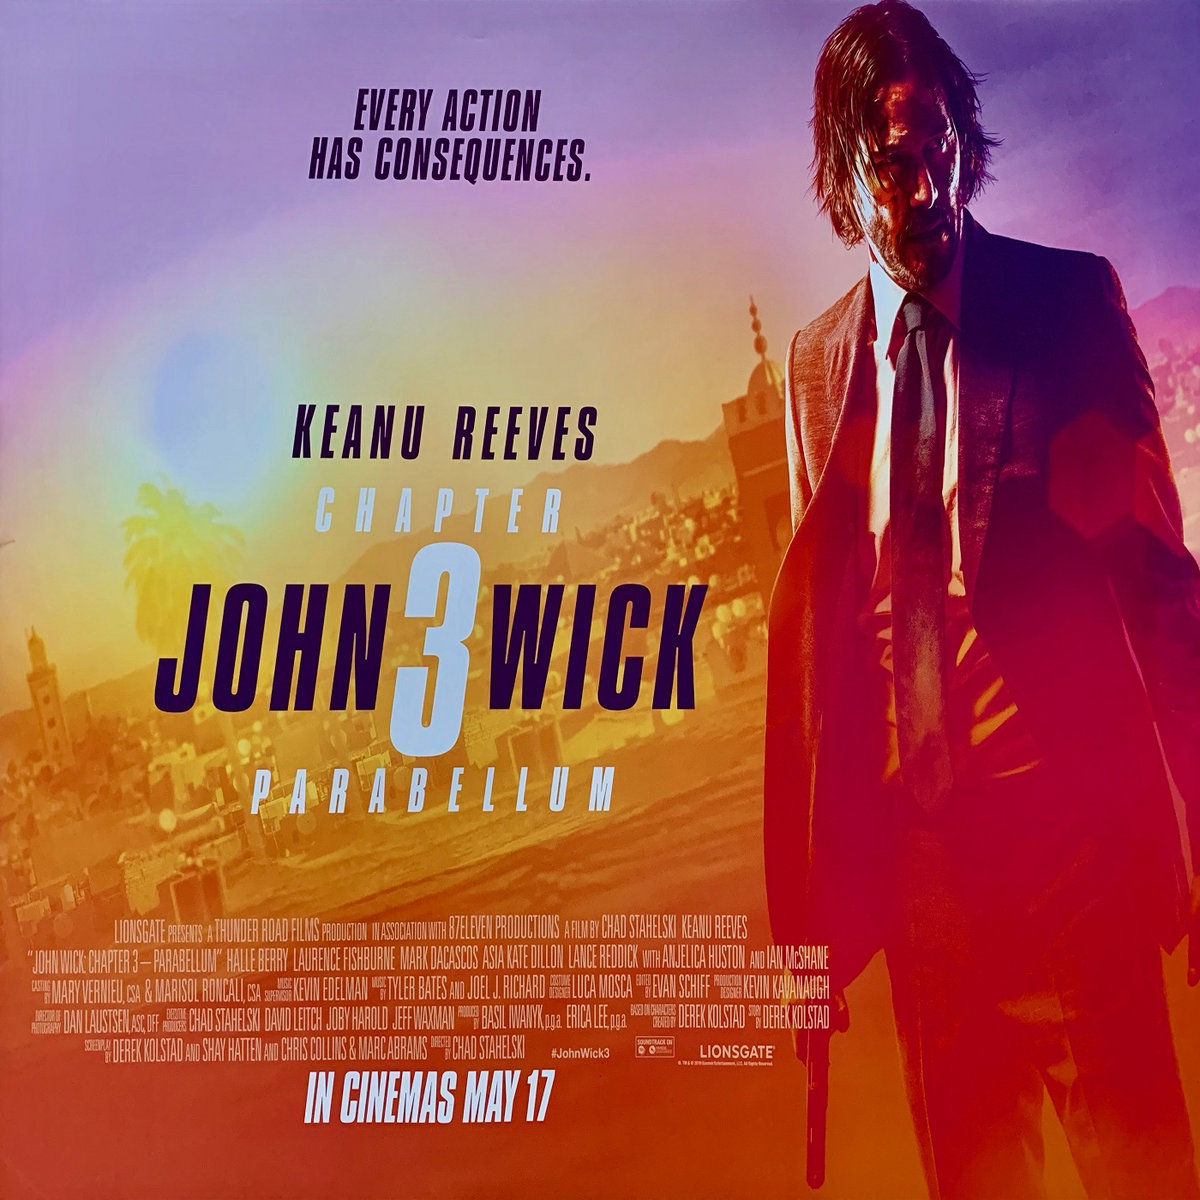 Watch John Wick Chapter 3 Parabellum 2019 Online Hd Full Movie Free Hd Fullmovie Online Free